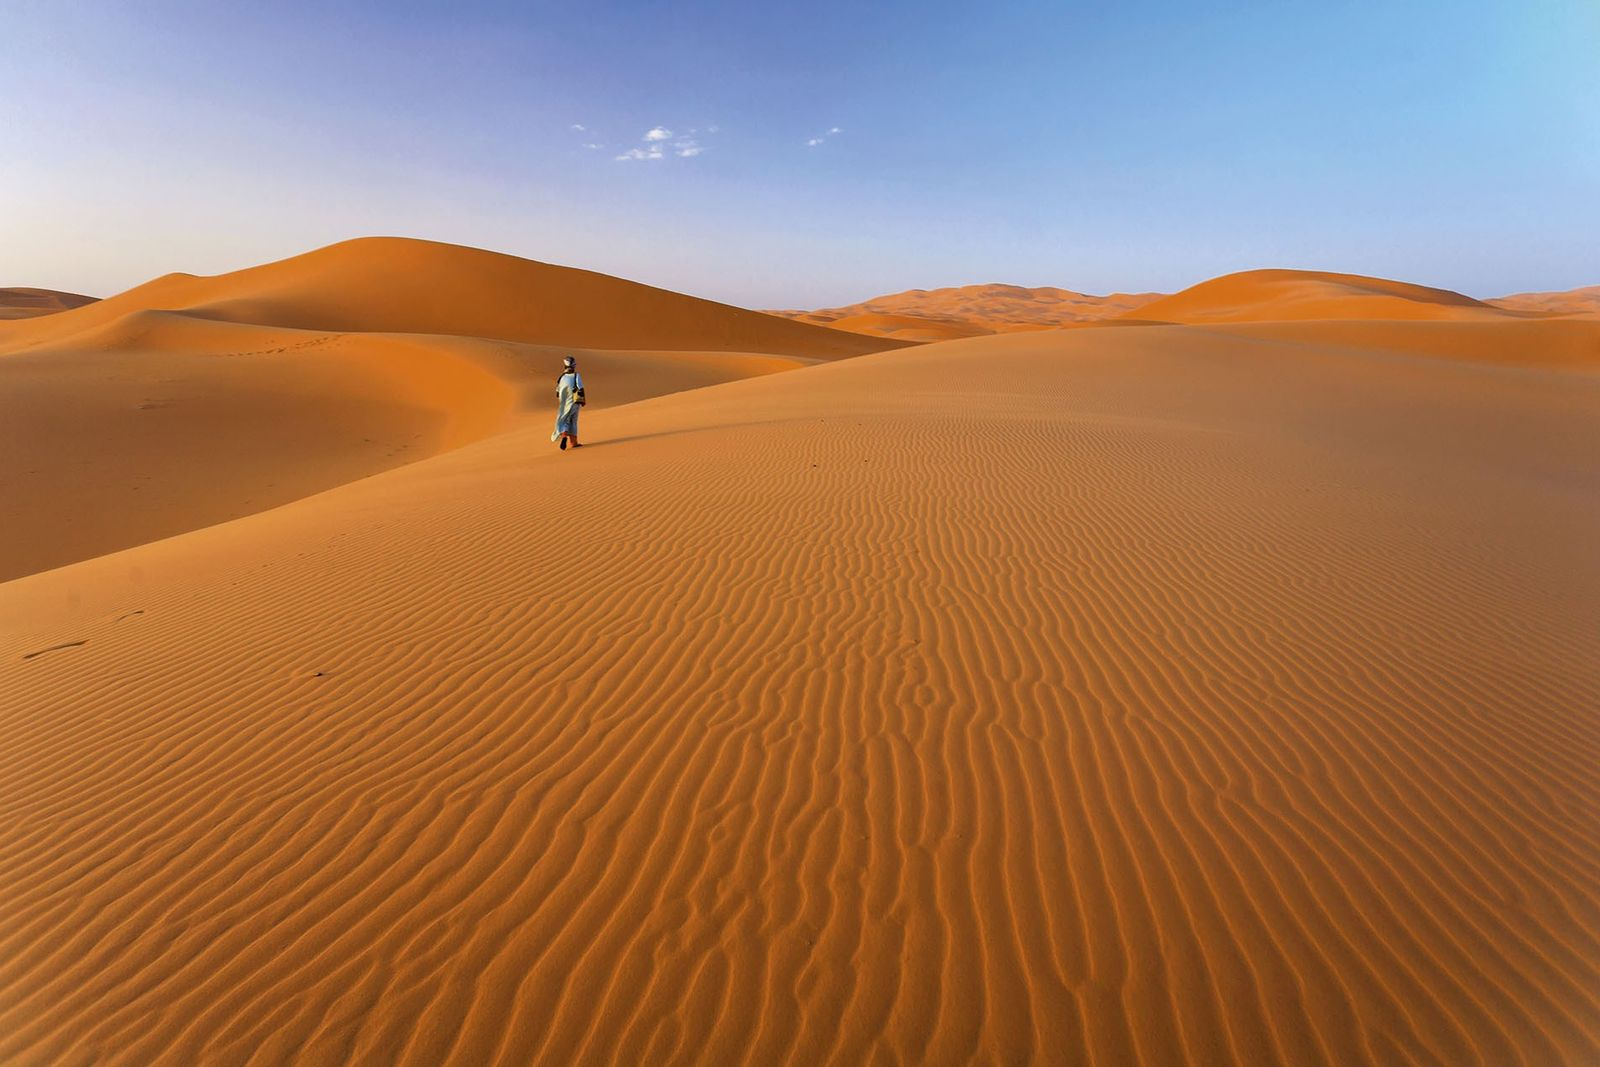 Erg Chebbi dunes, Morocco